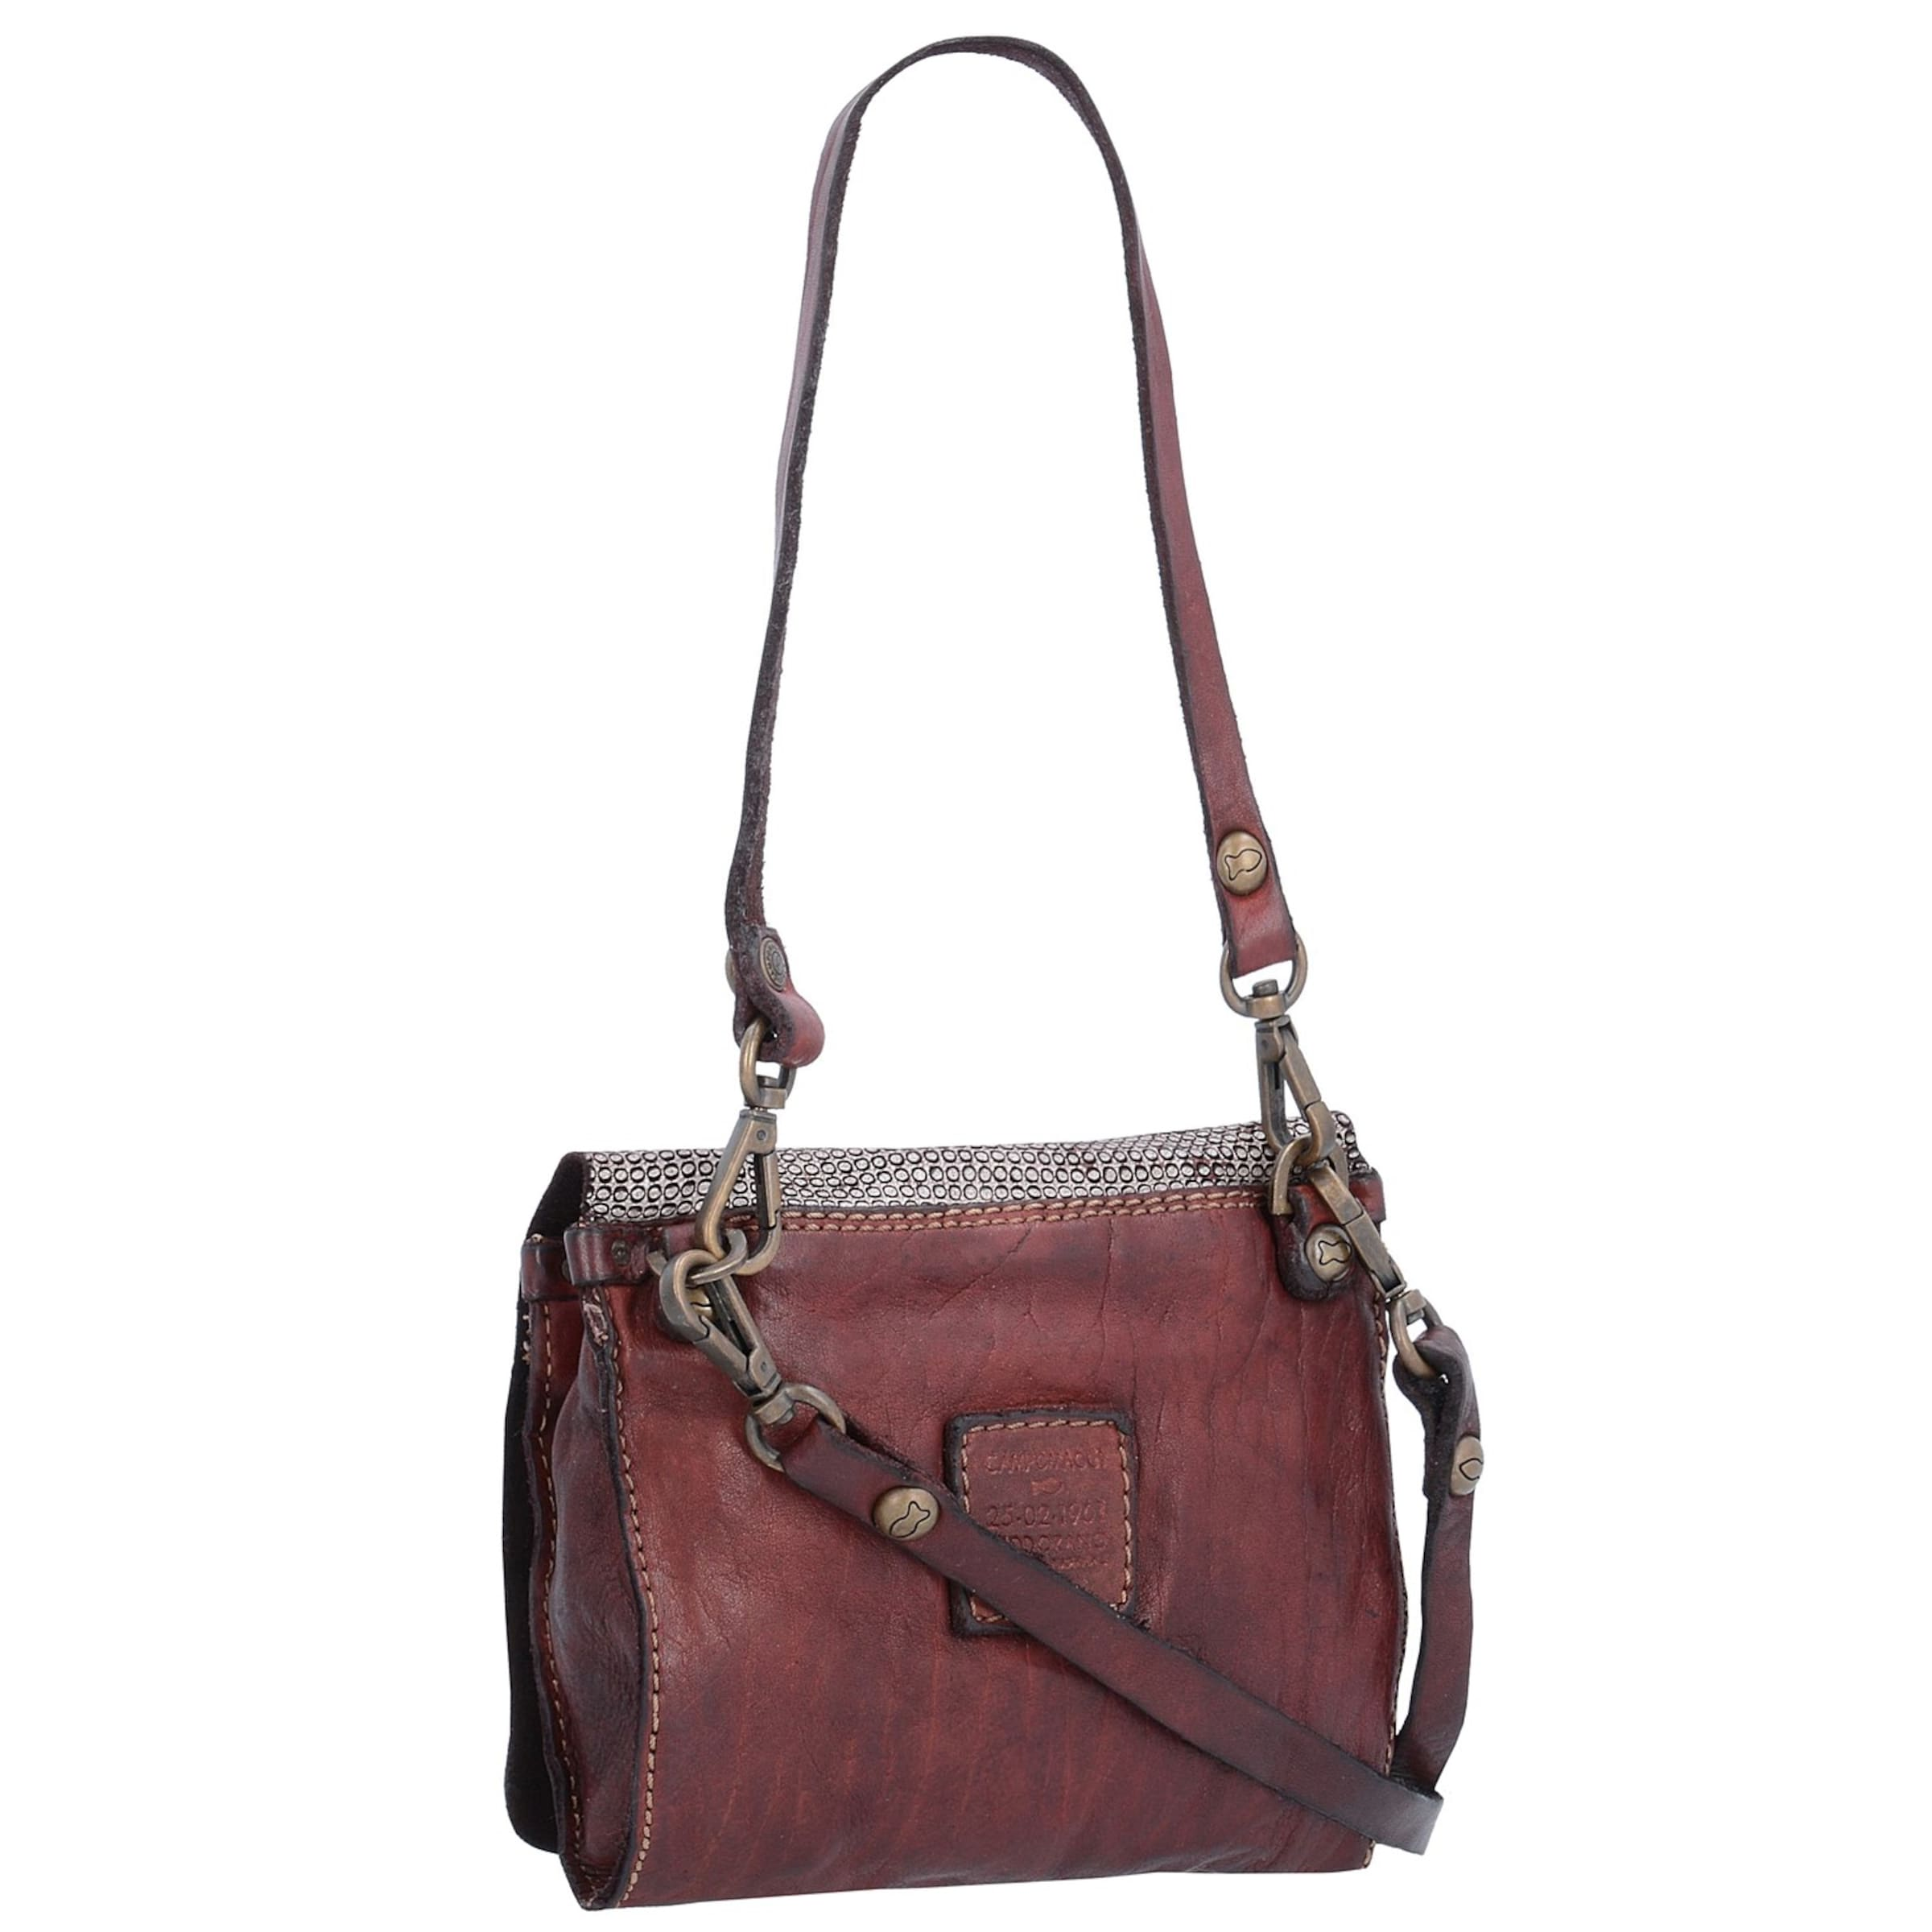 Campomaggi Mini Bag Bag 17 Campomaggi Umh盲ngetasche Mini cm Bauletto Bauletto Leder qPntw